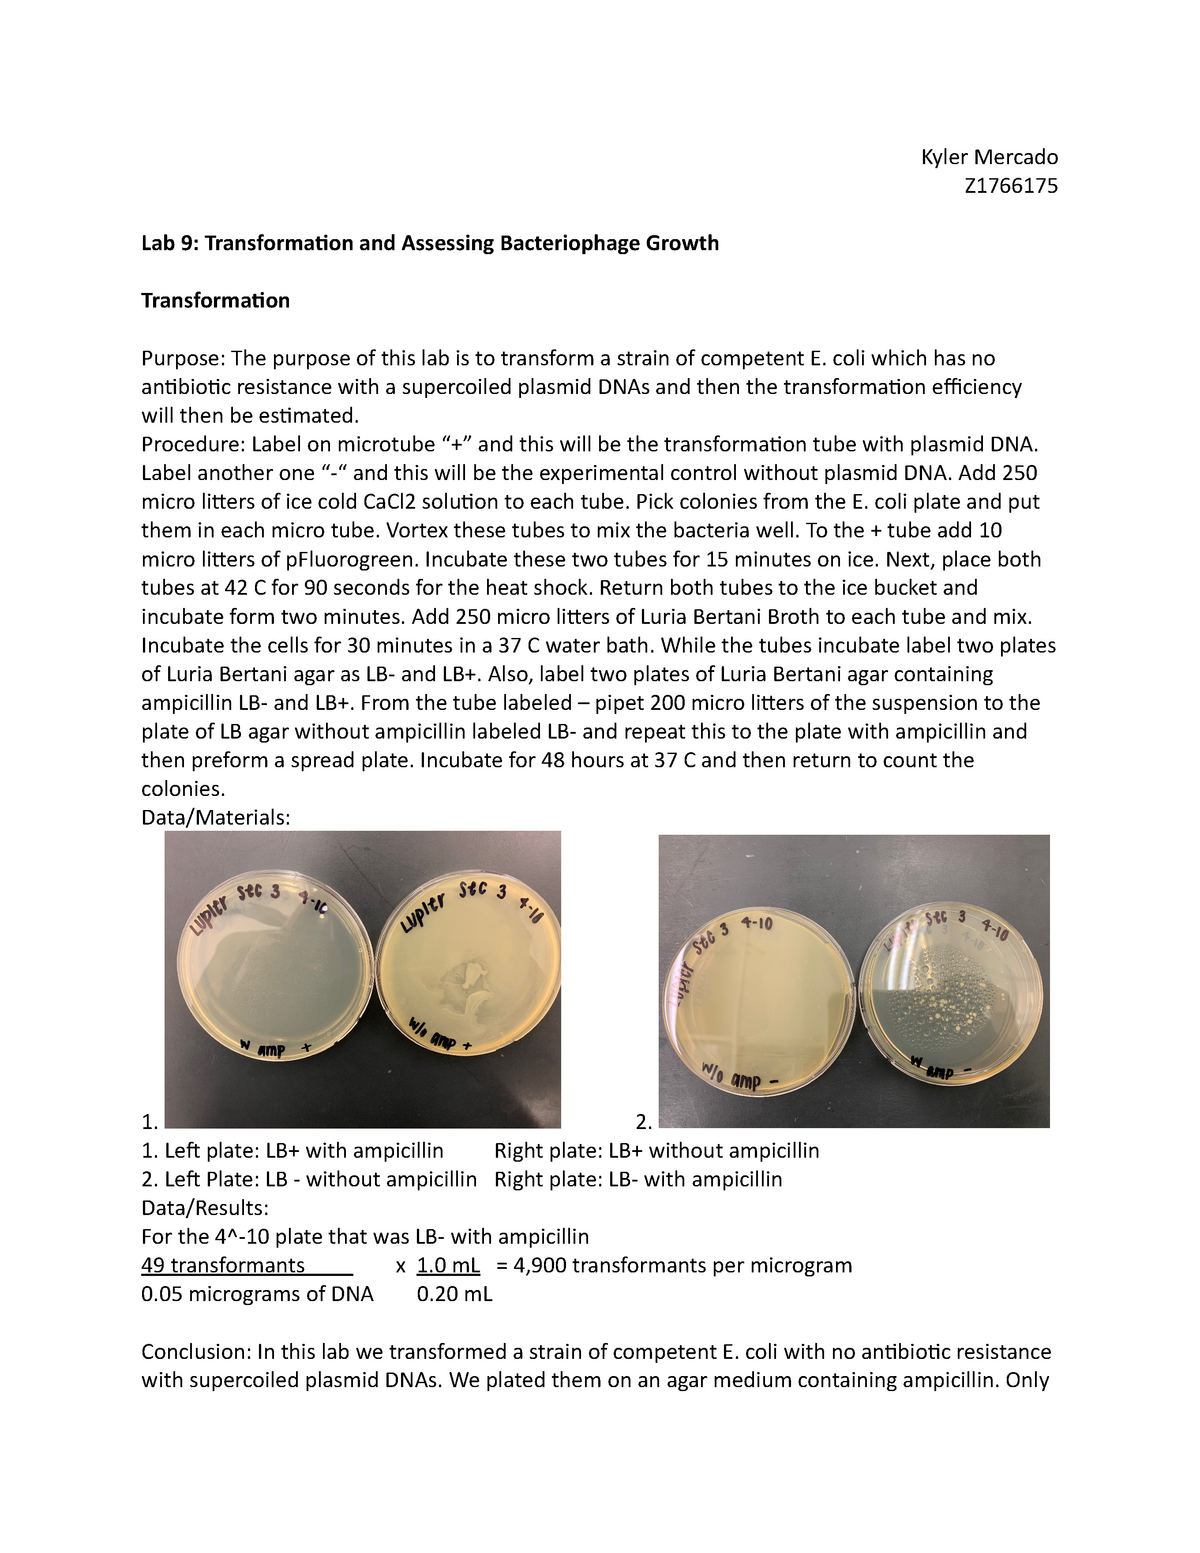 LAB 9 - BIOS 313 lab - BIOS 313 : Microbiology - StuDocu